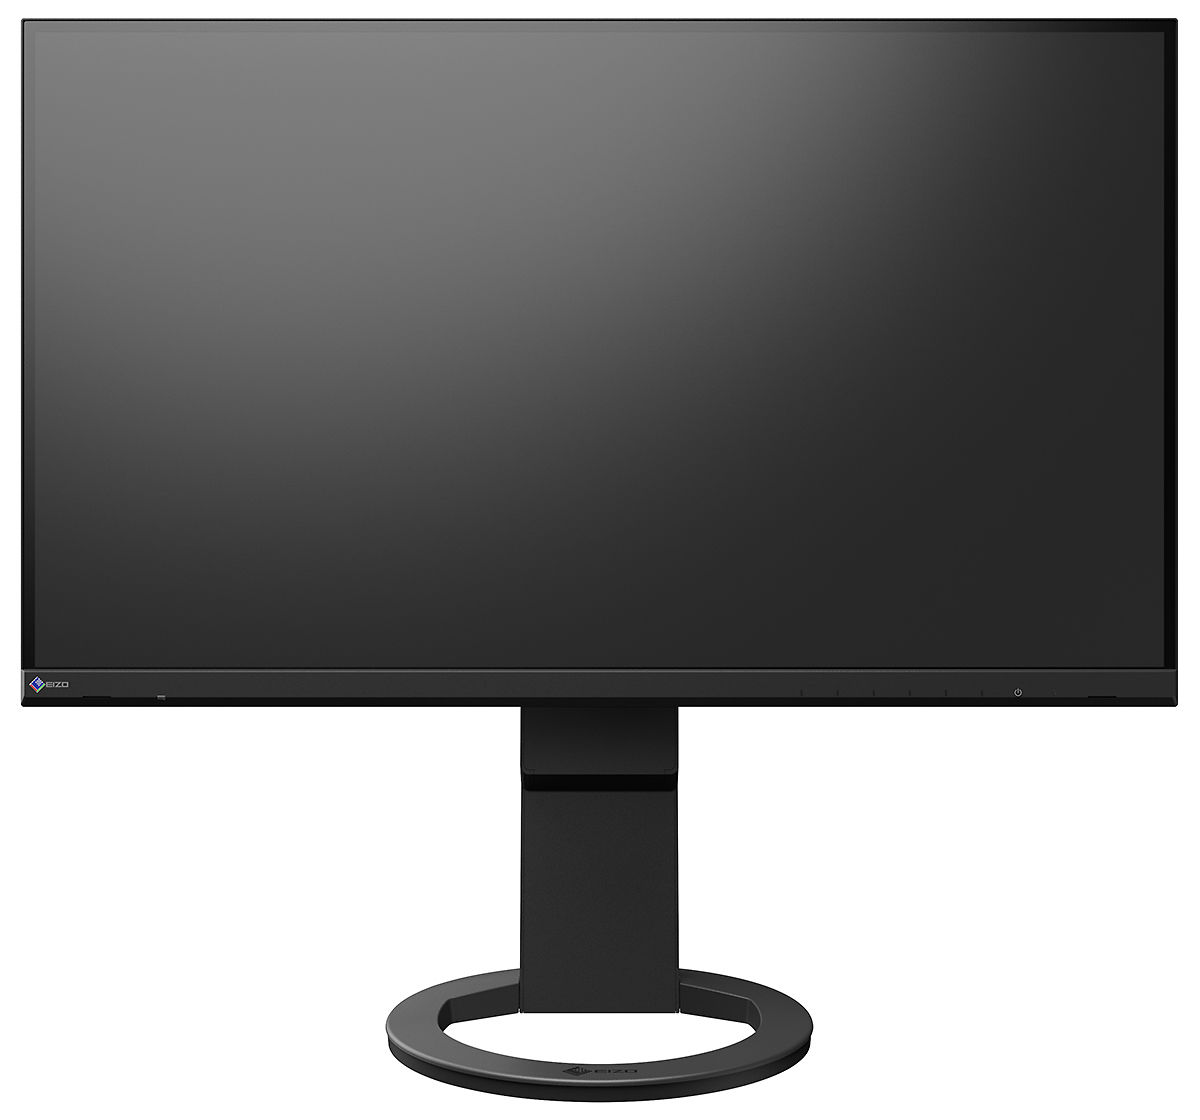 "Eizo Flexscan EV2760 27"" Monitor Image"